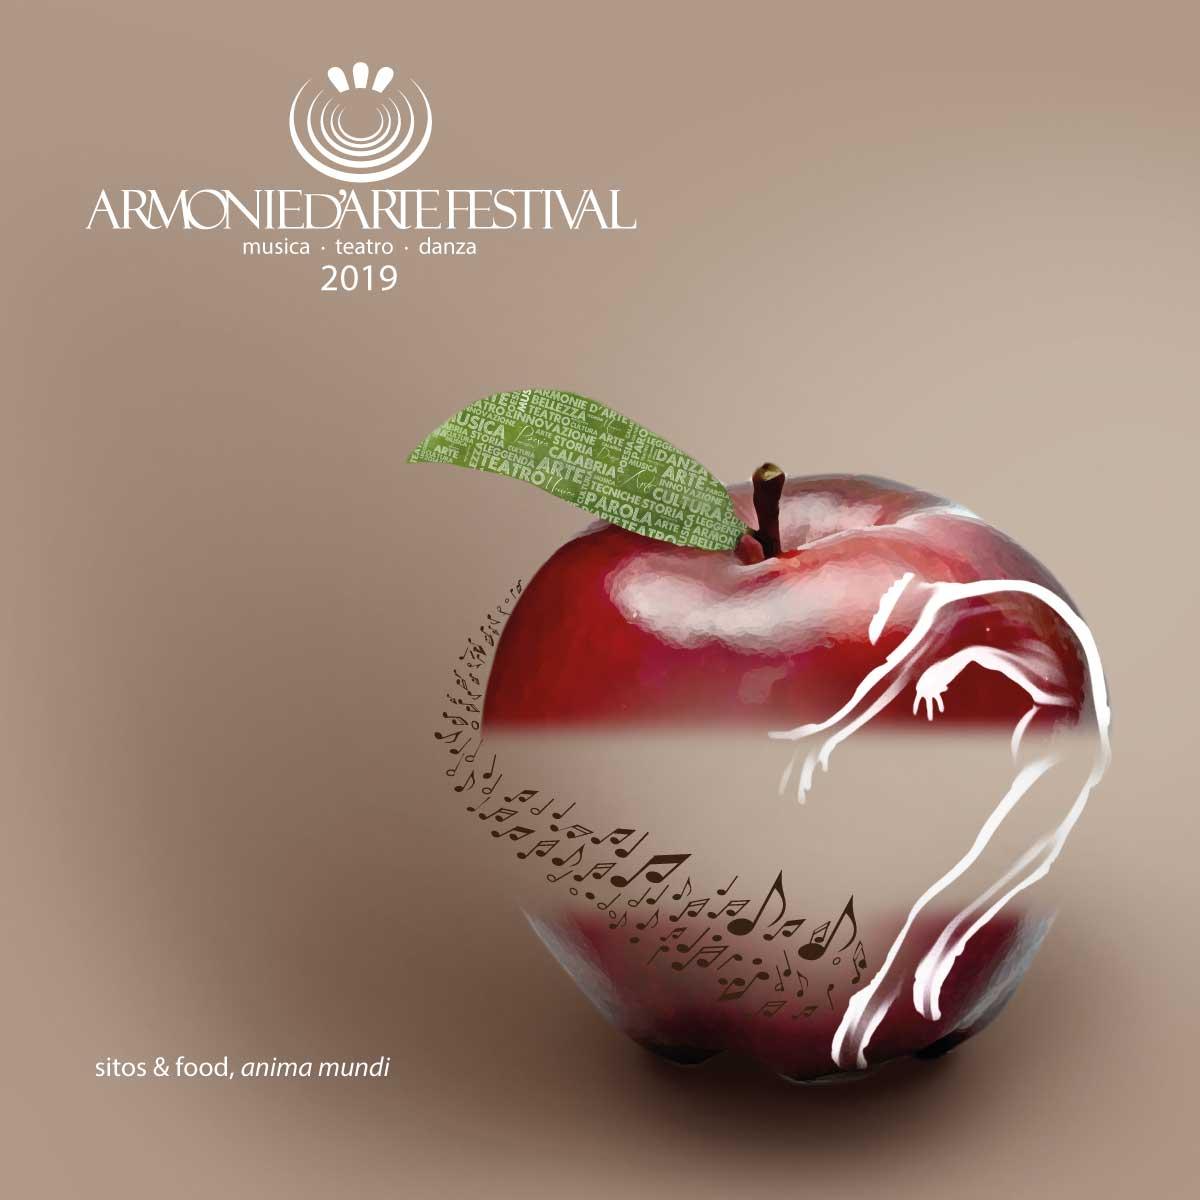 2019 Armonied'artefestival